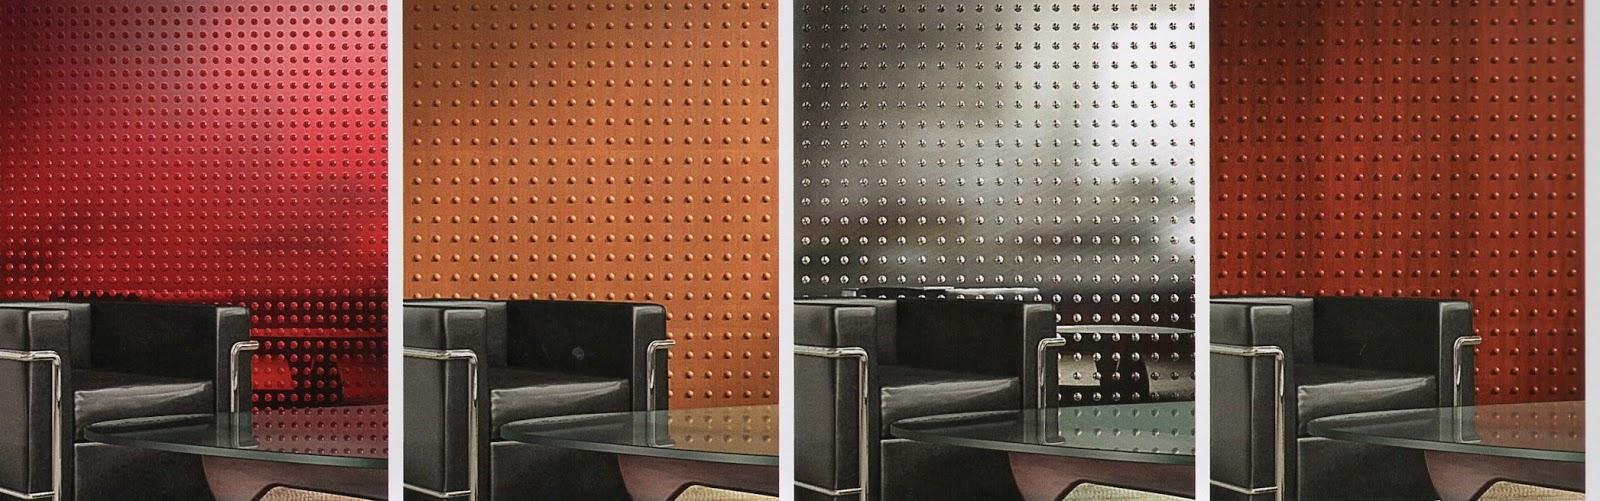 u003cimg  diamond-plate-sheets.gif  altu003d diamond plate & Diamond Plate Wall Panels | Chrome Diamond Plate Plastic sheets